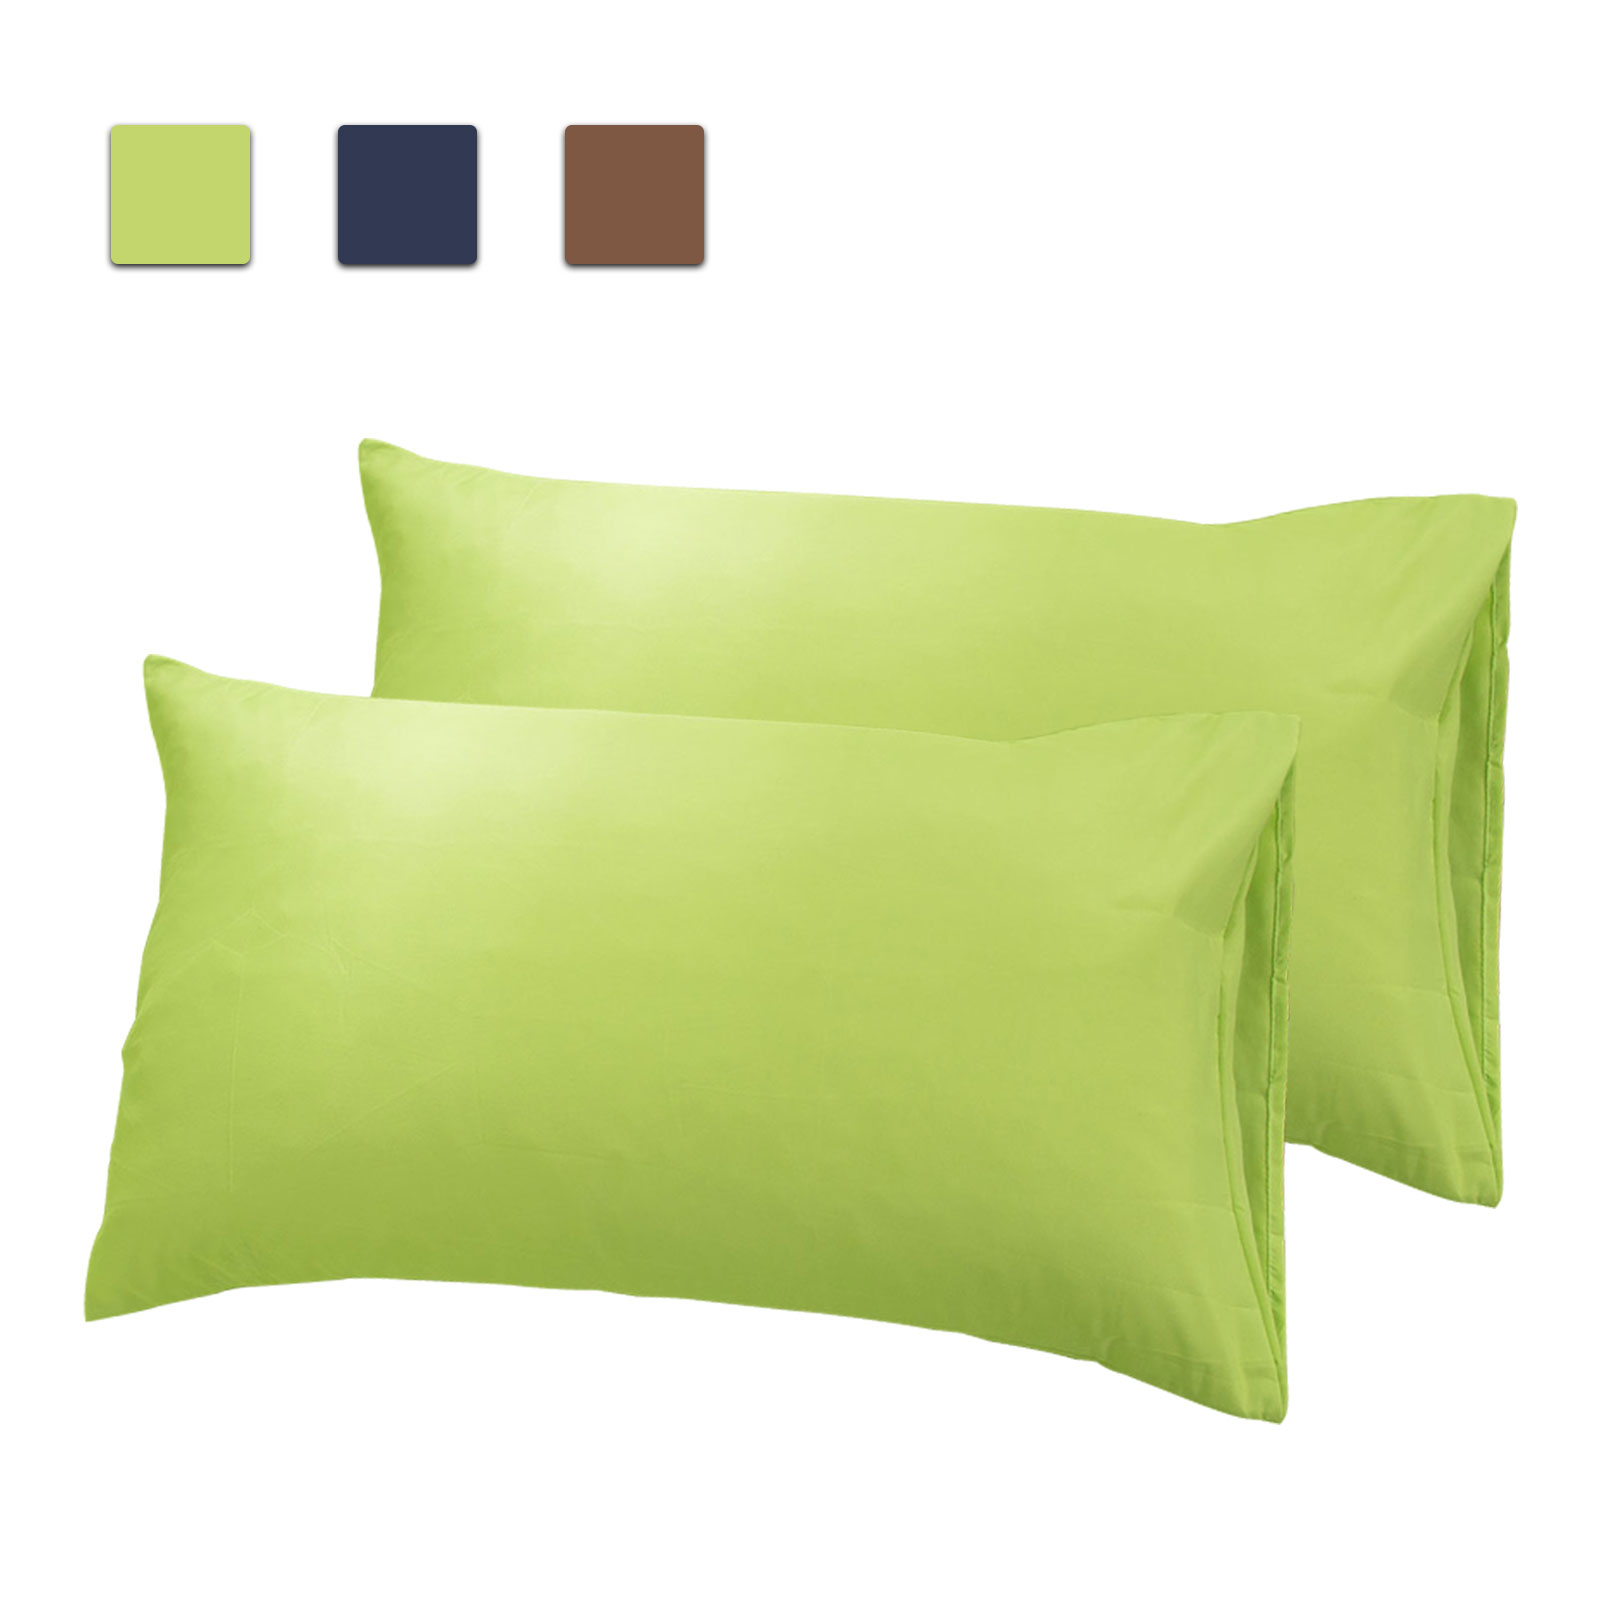 eeekit 2pcs cotton pillow cases standard pillowcase long staple pure natural cotton pillows for sleeping soft silky sateen weave bed pillow cover